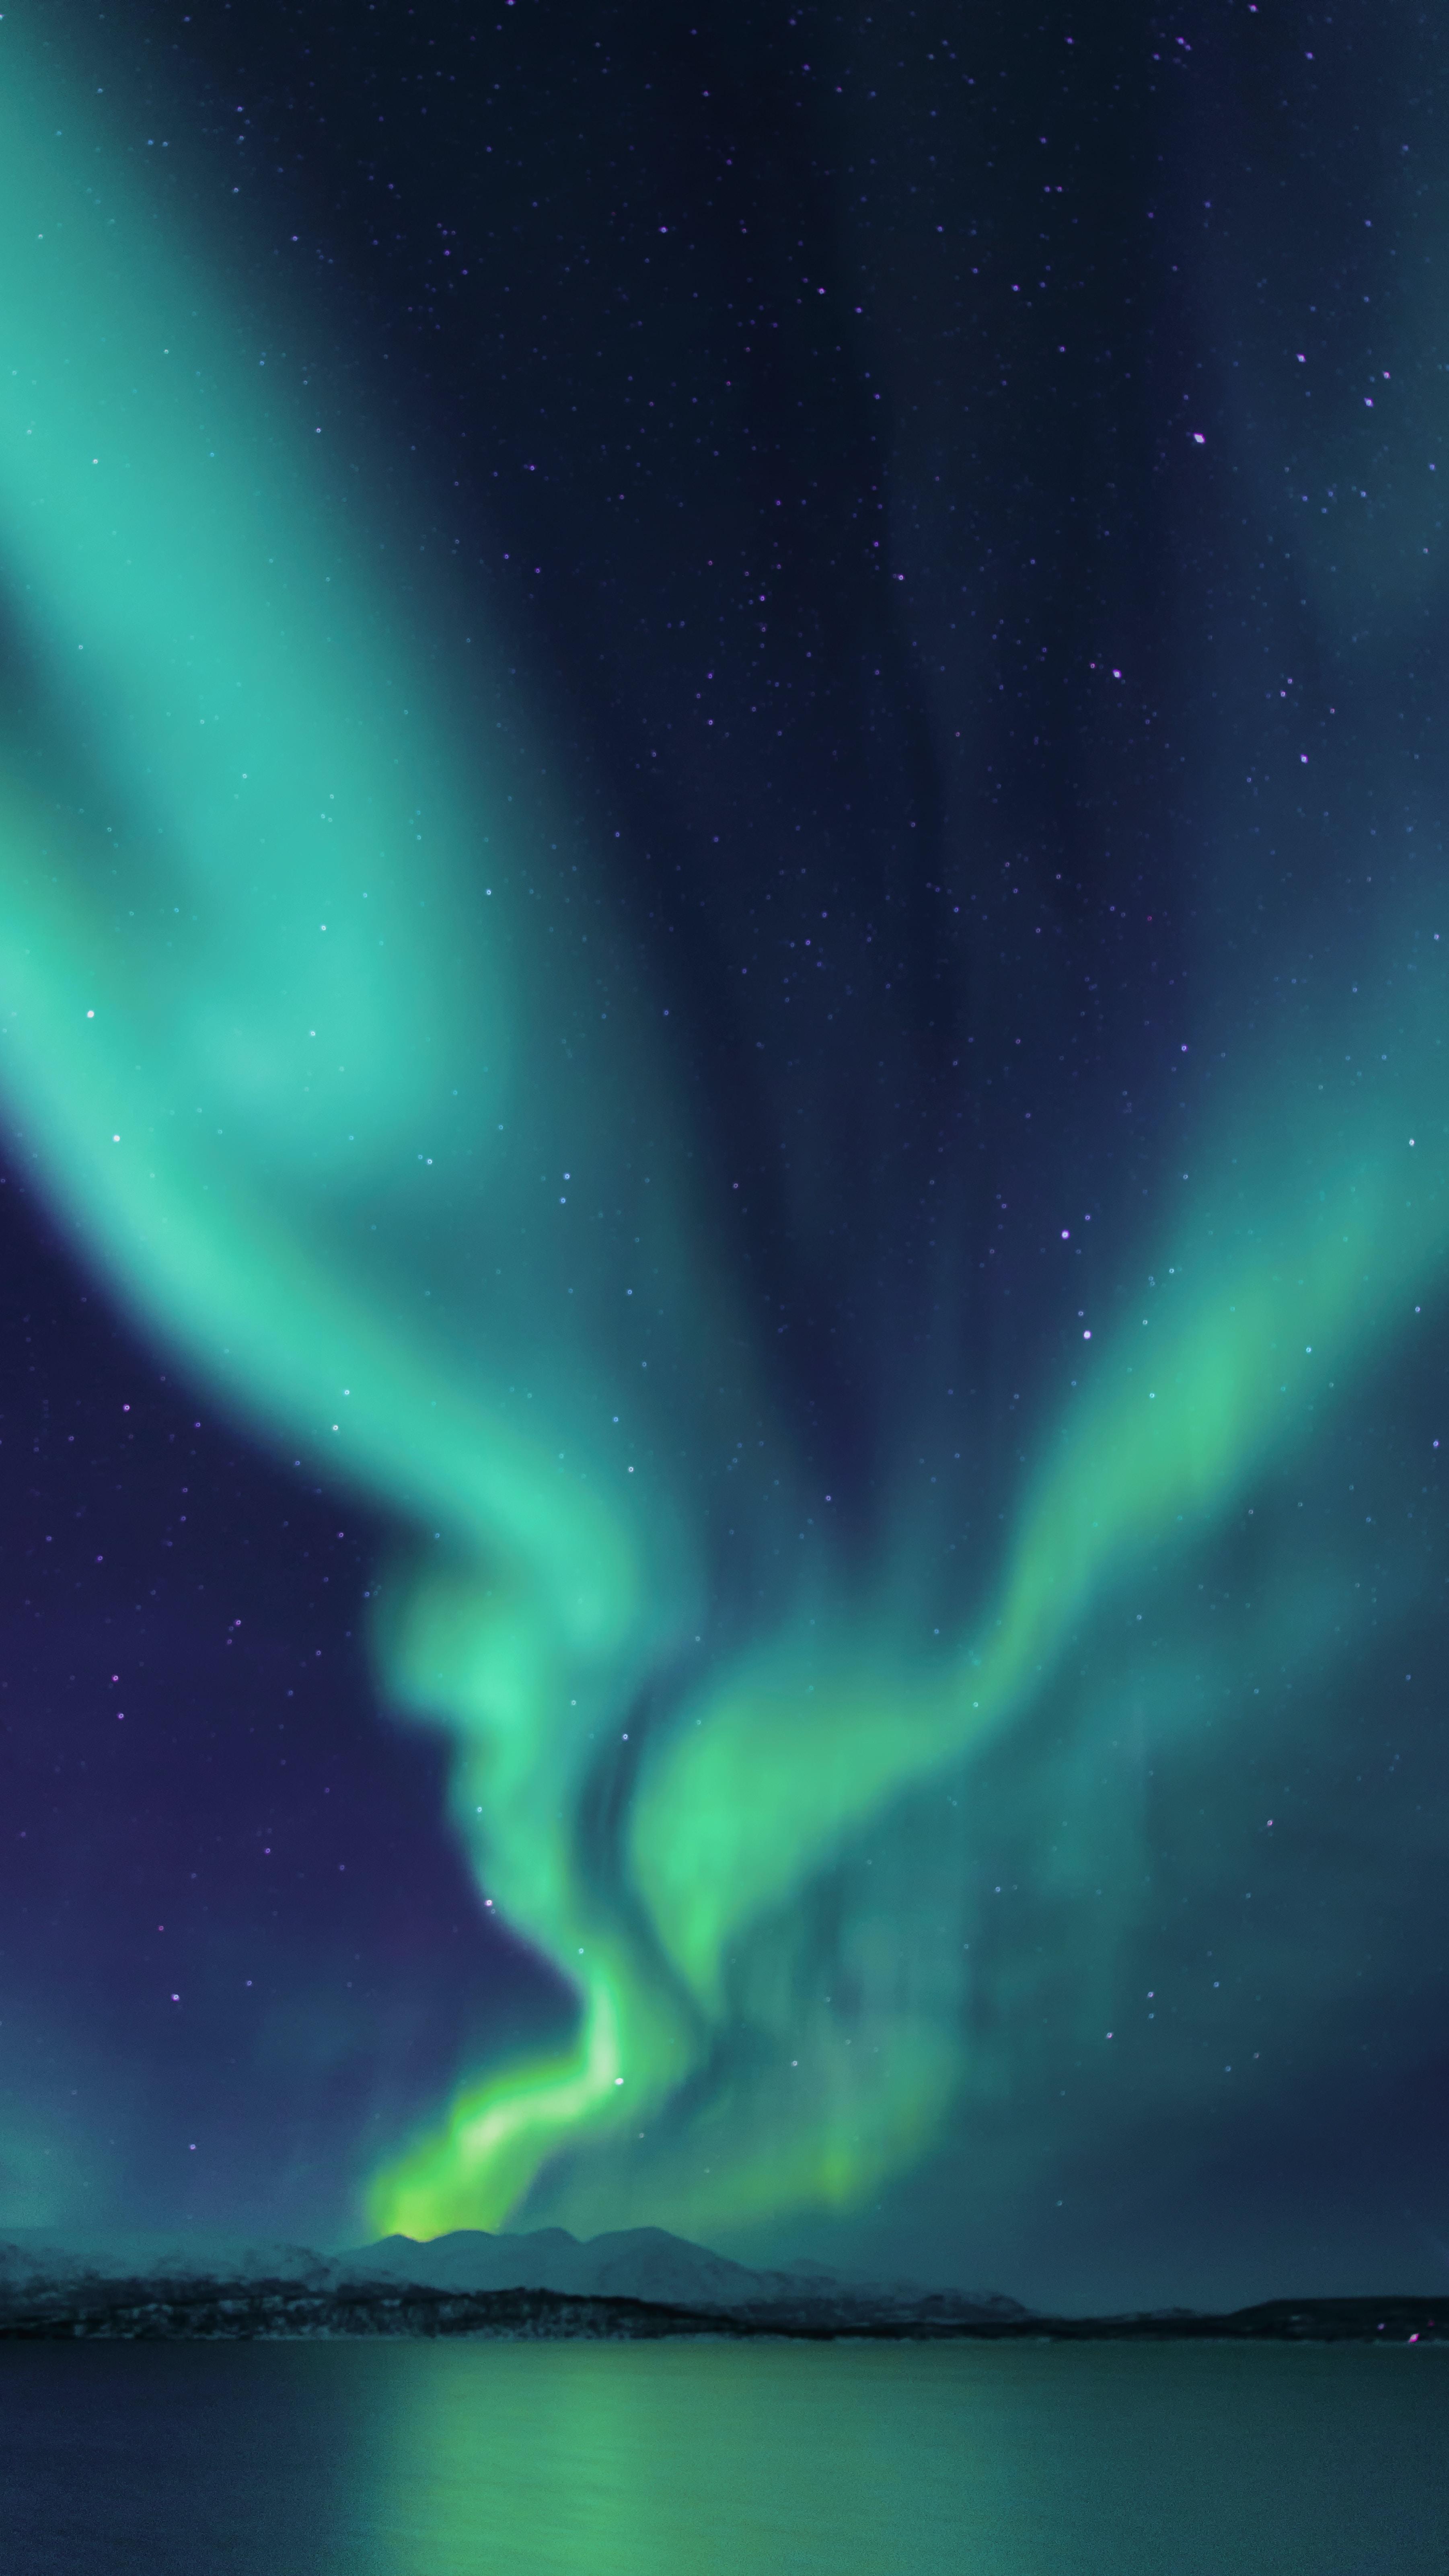 photograph of aurora lights